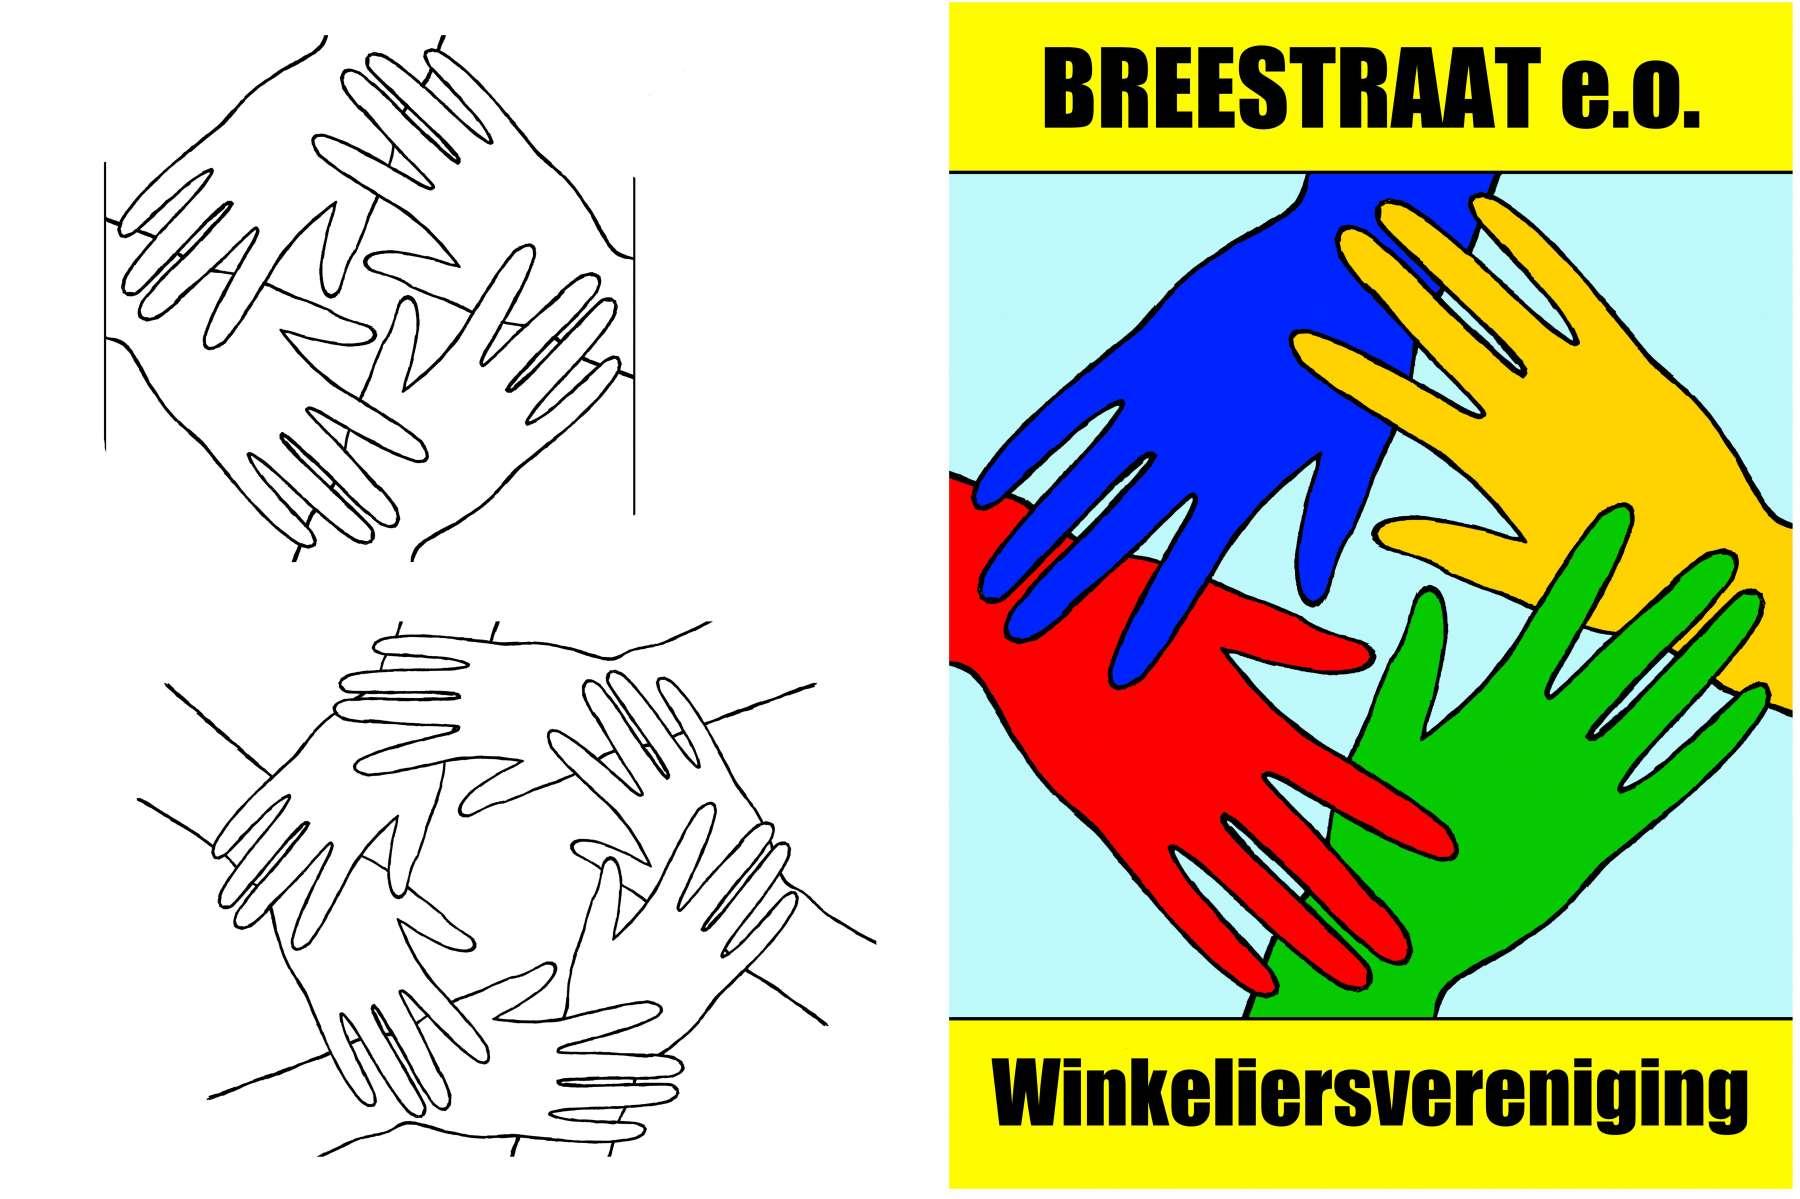 Winkeliersvereniging Breestraat - vignet en vlag